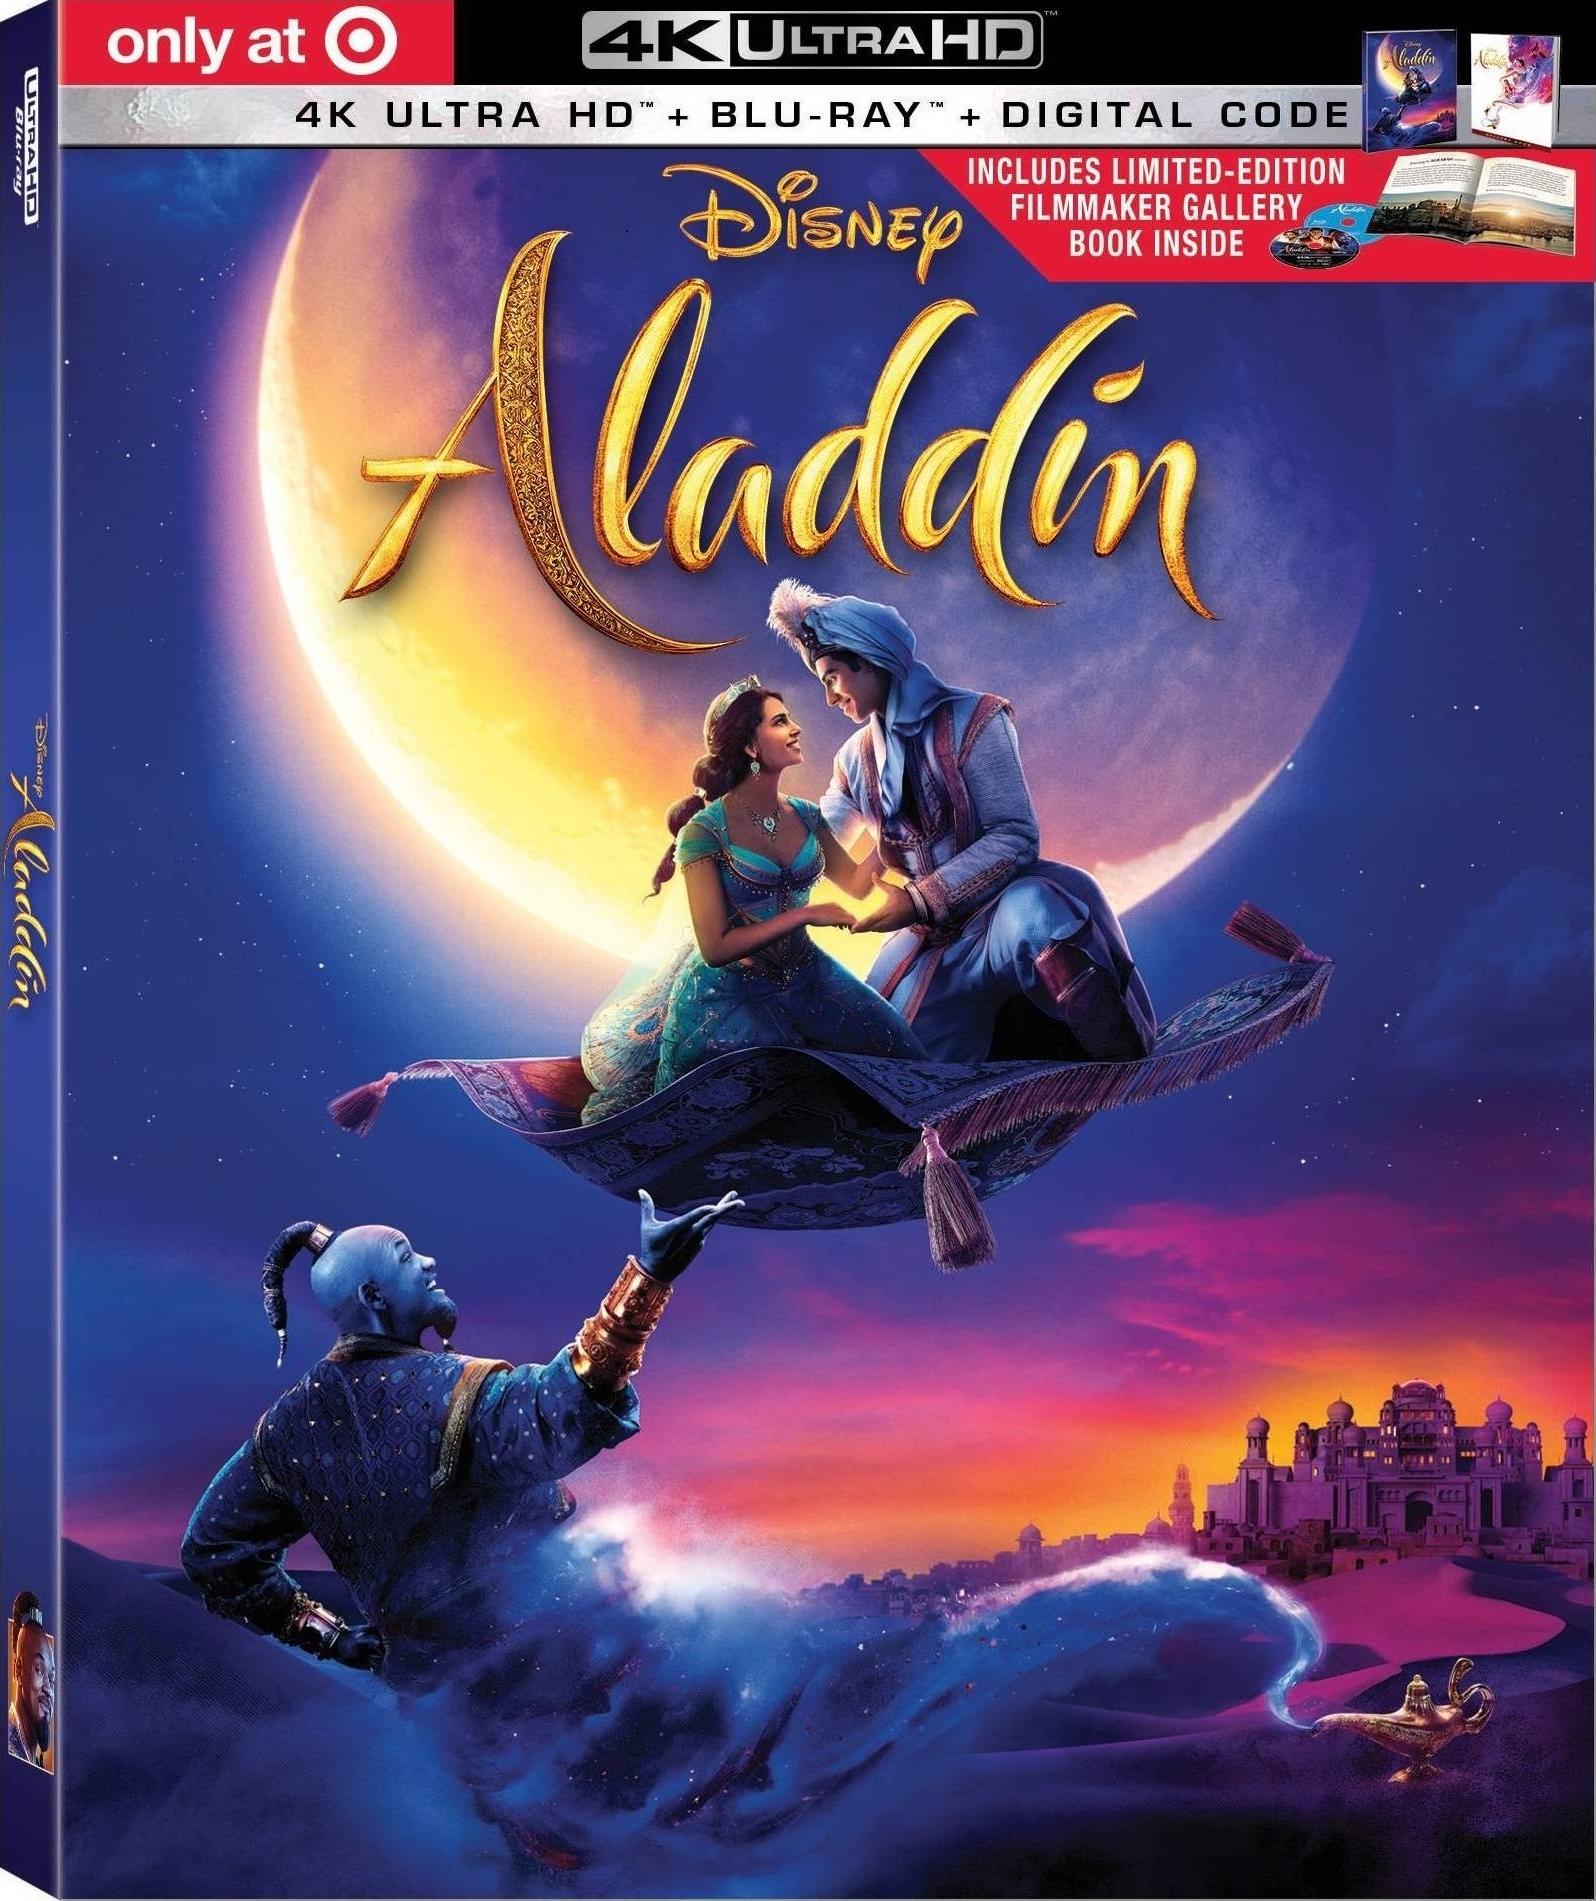 ALADDIN (2019) & Original Animated Film Announced For 4K